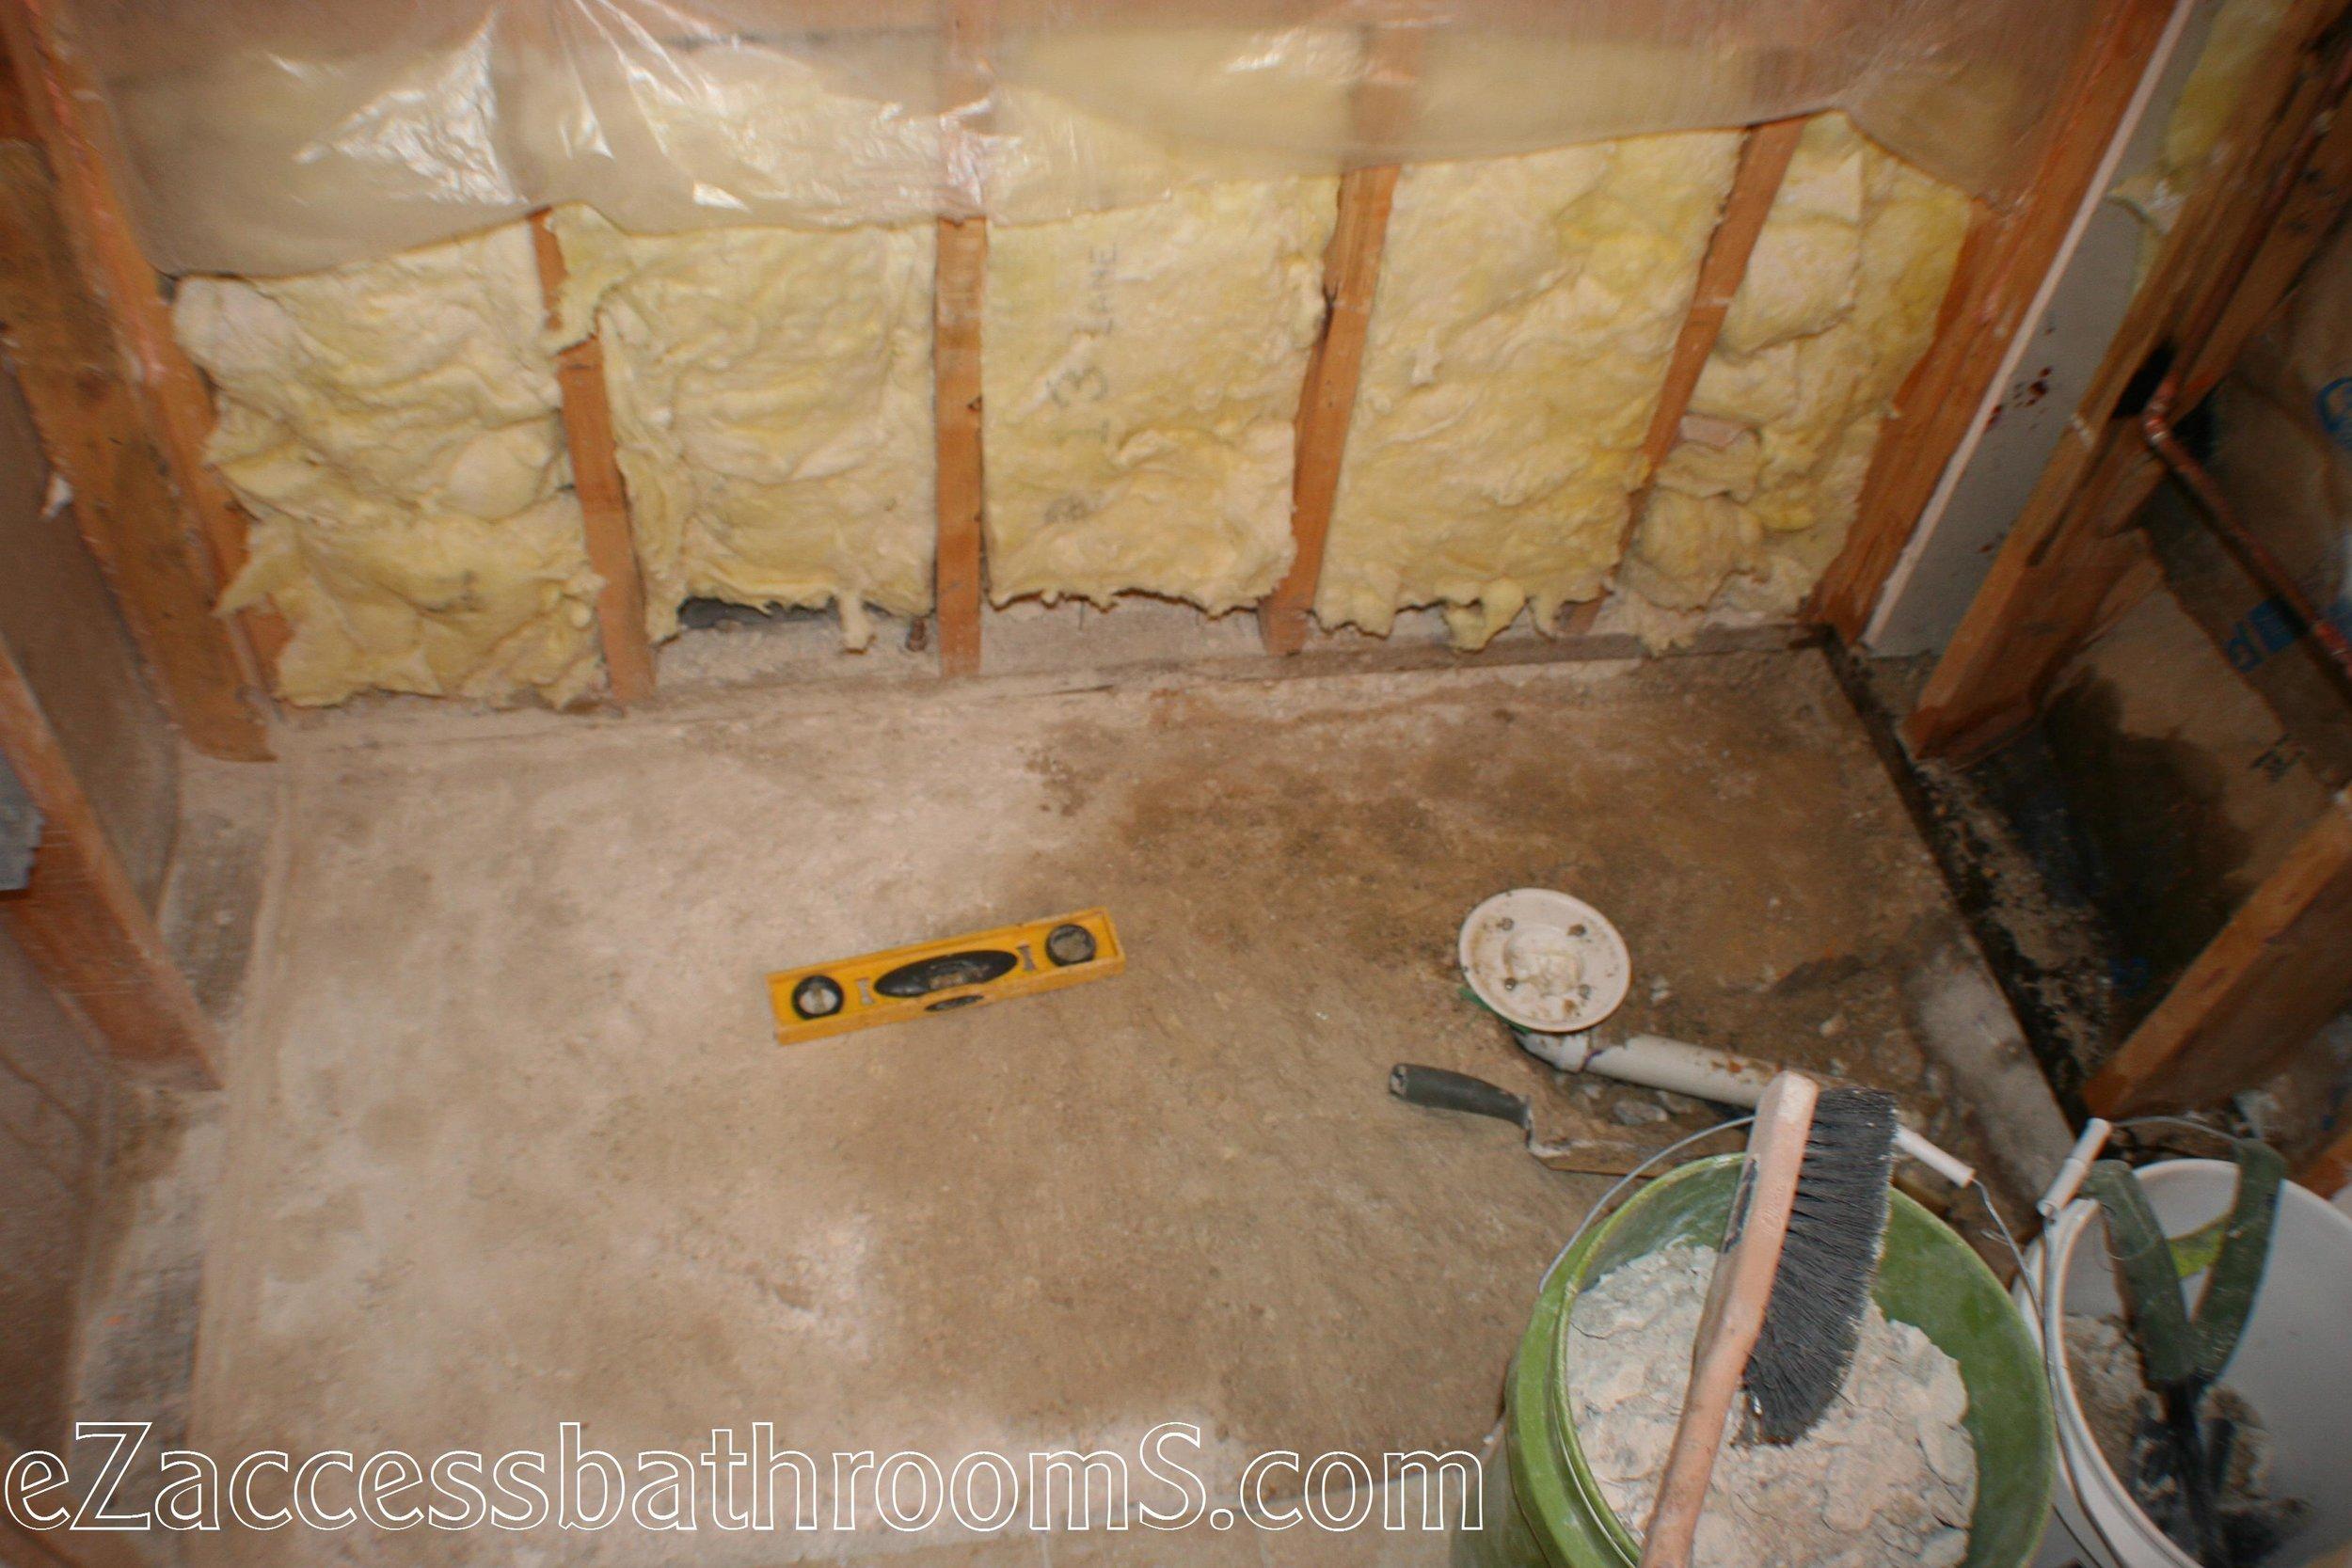 cheap tub to shower conversion ezaccessbathrooms.com 020.JPG